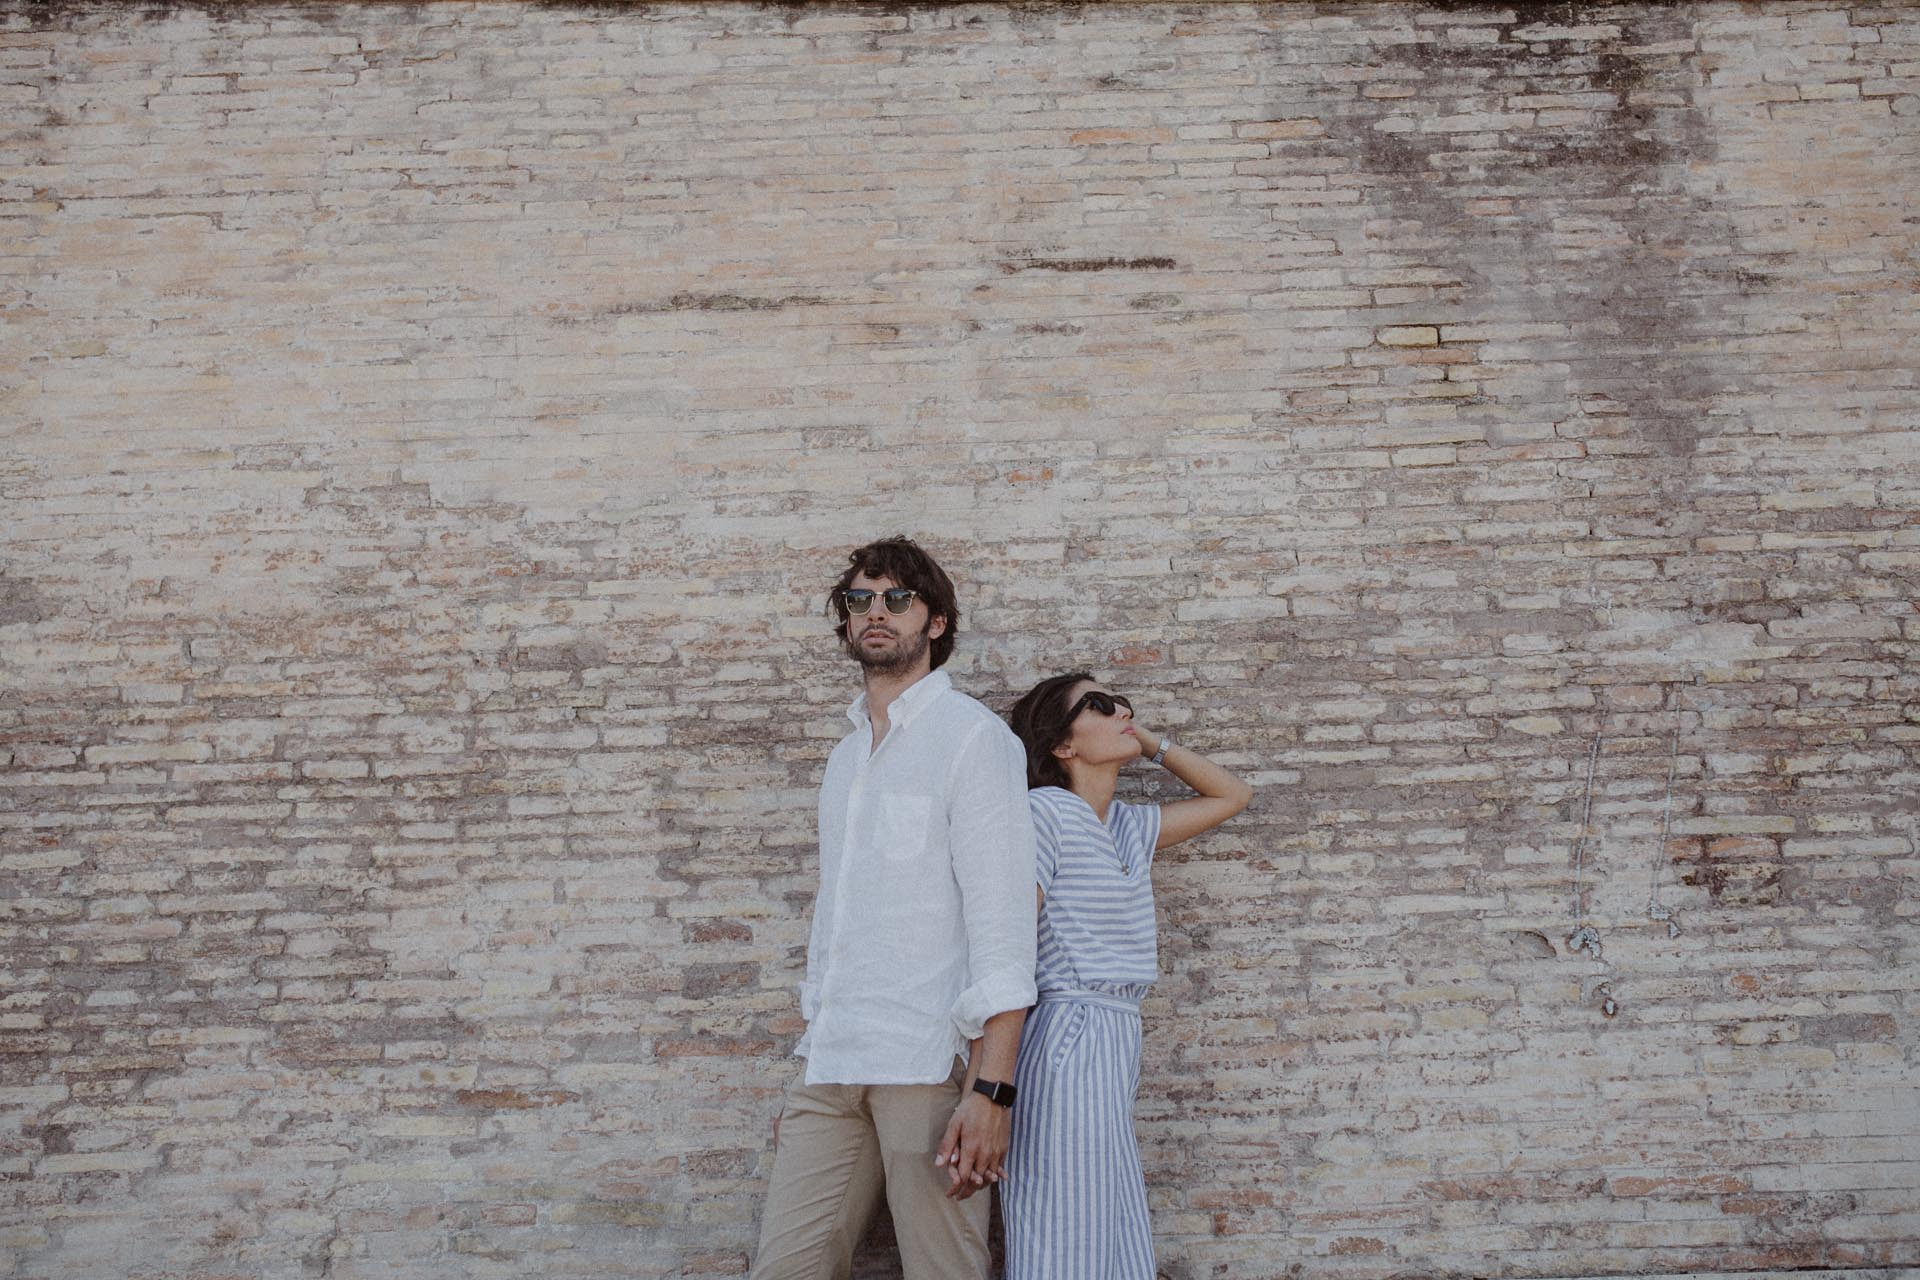 coupleshooting-roma-hochzeitsfotografen-wien-agnesundandi-28